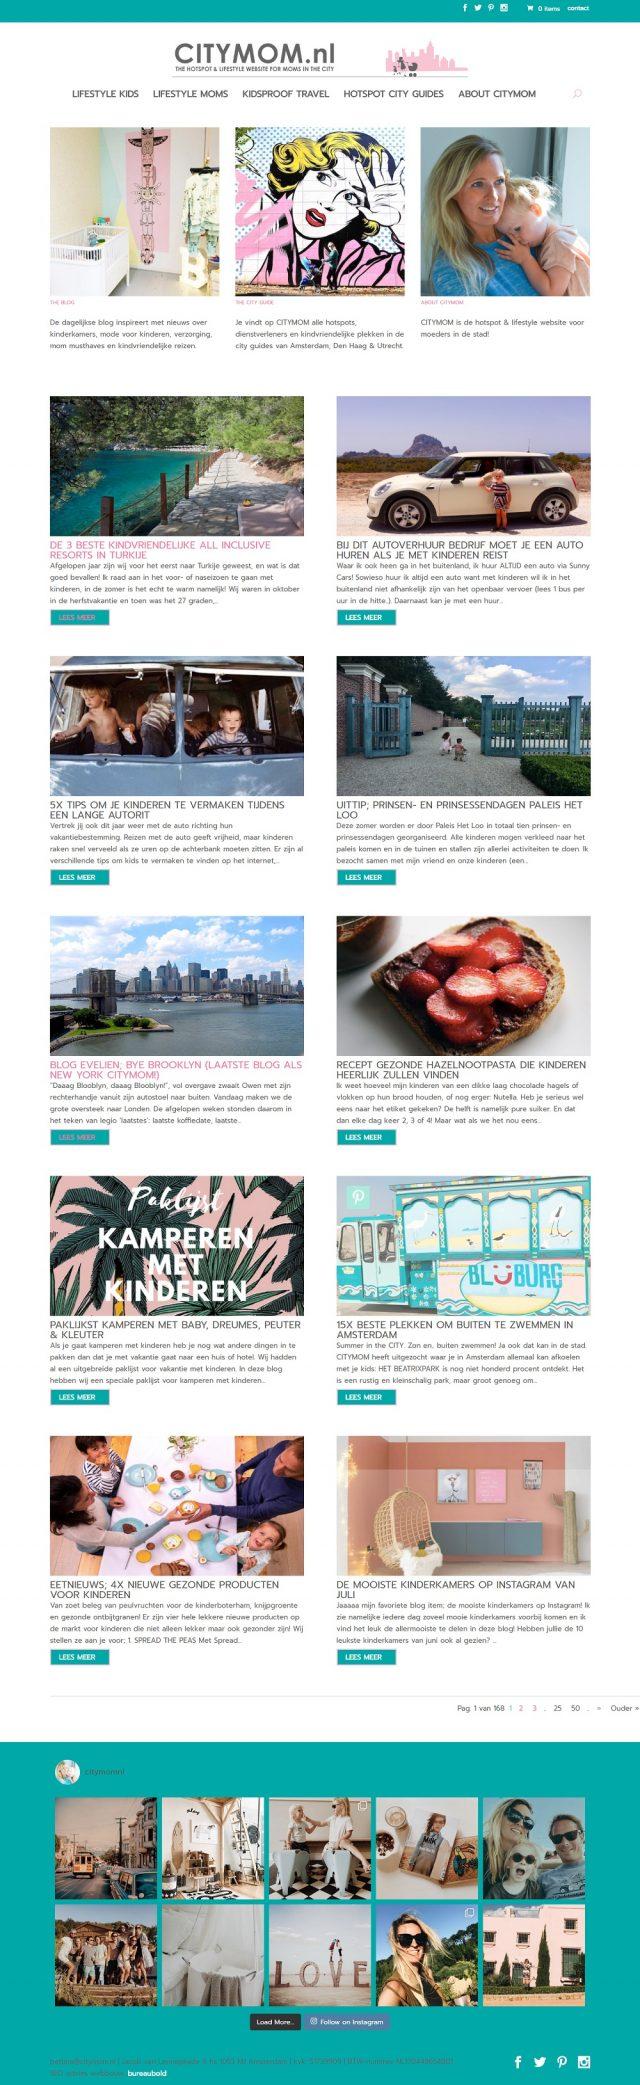 Homepage Citymom.nl